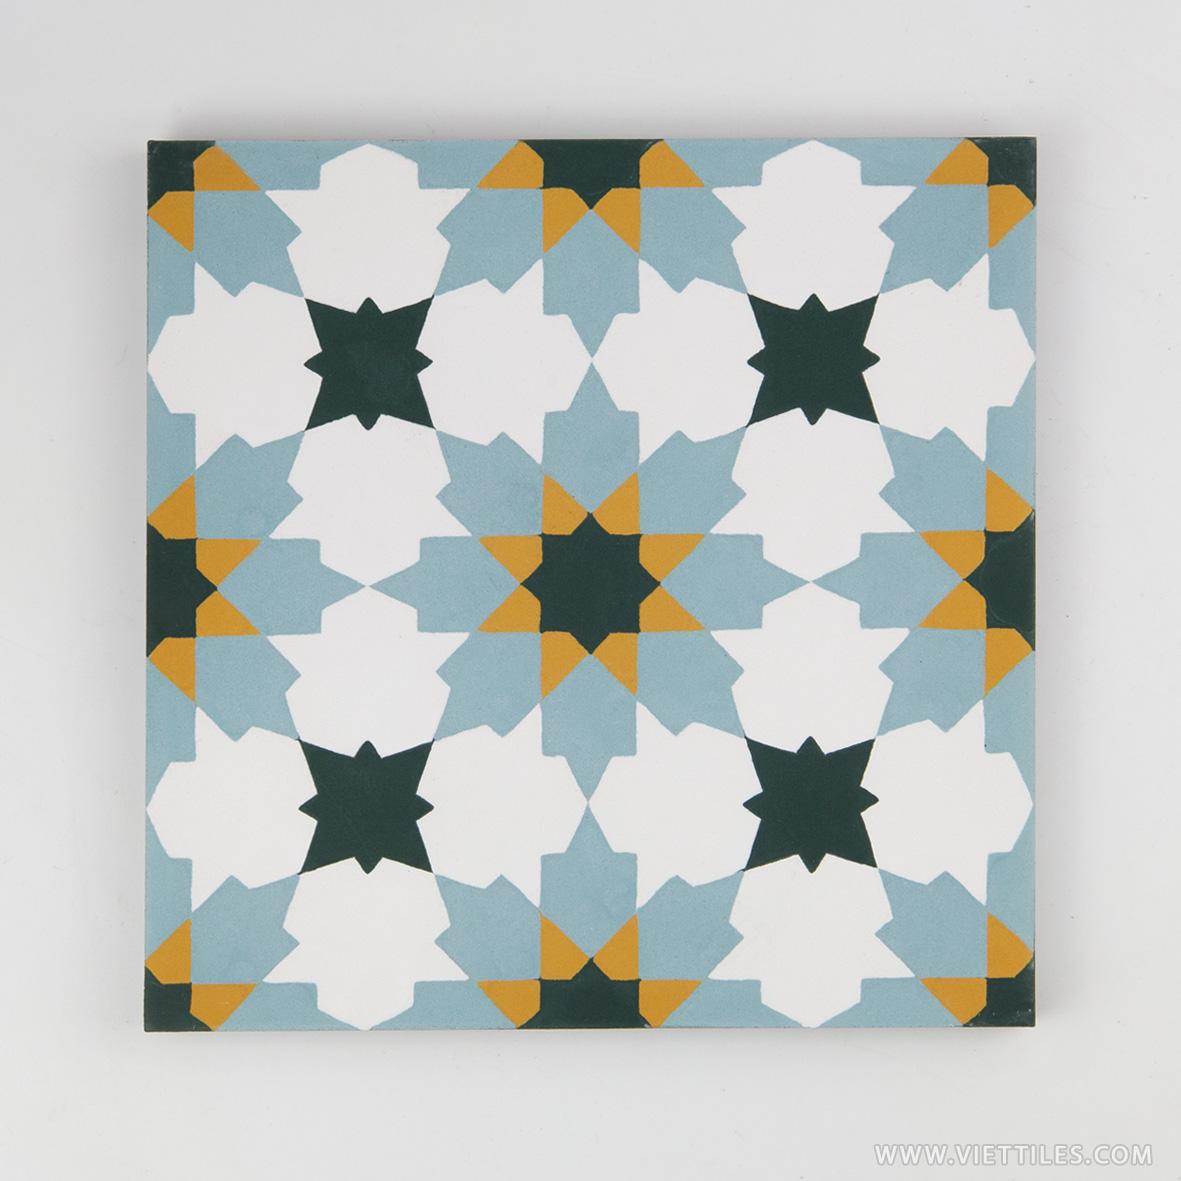 V20-028-F03 Cement tile